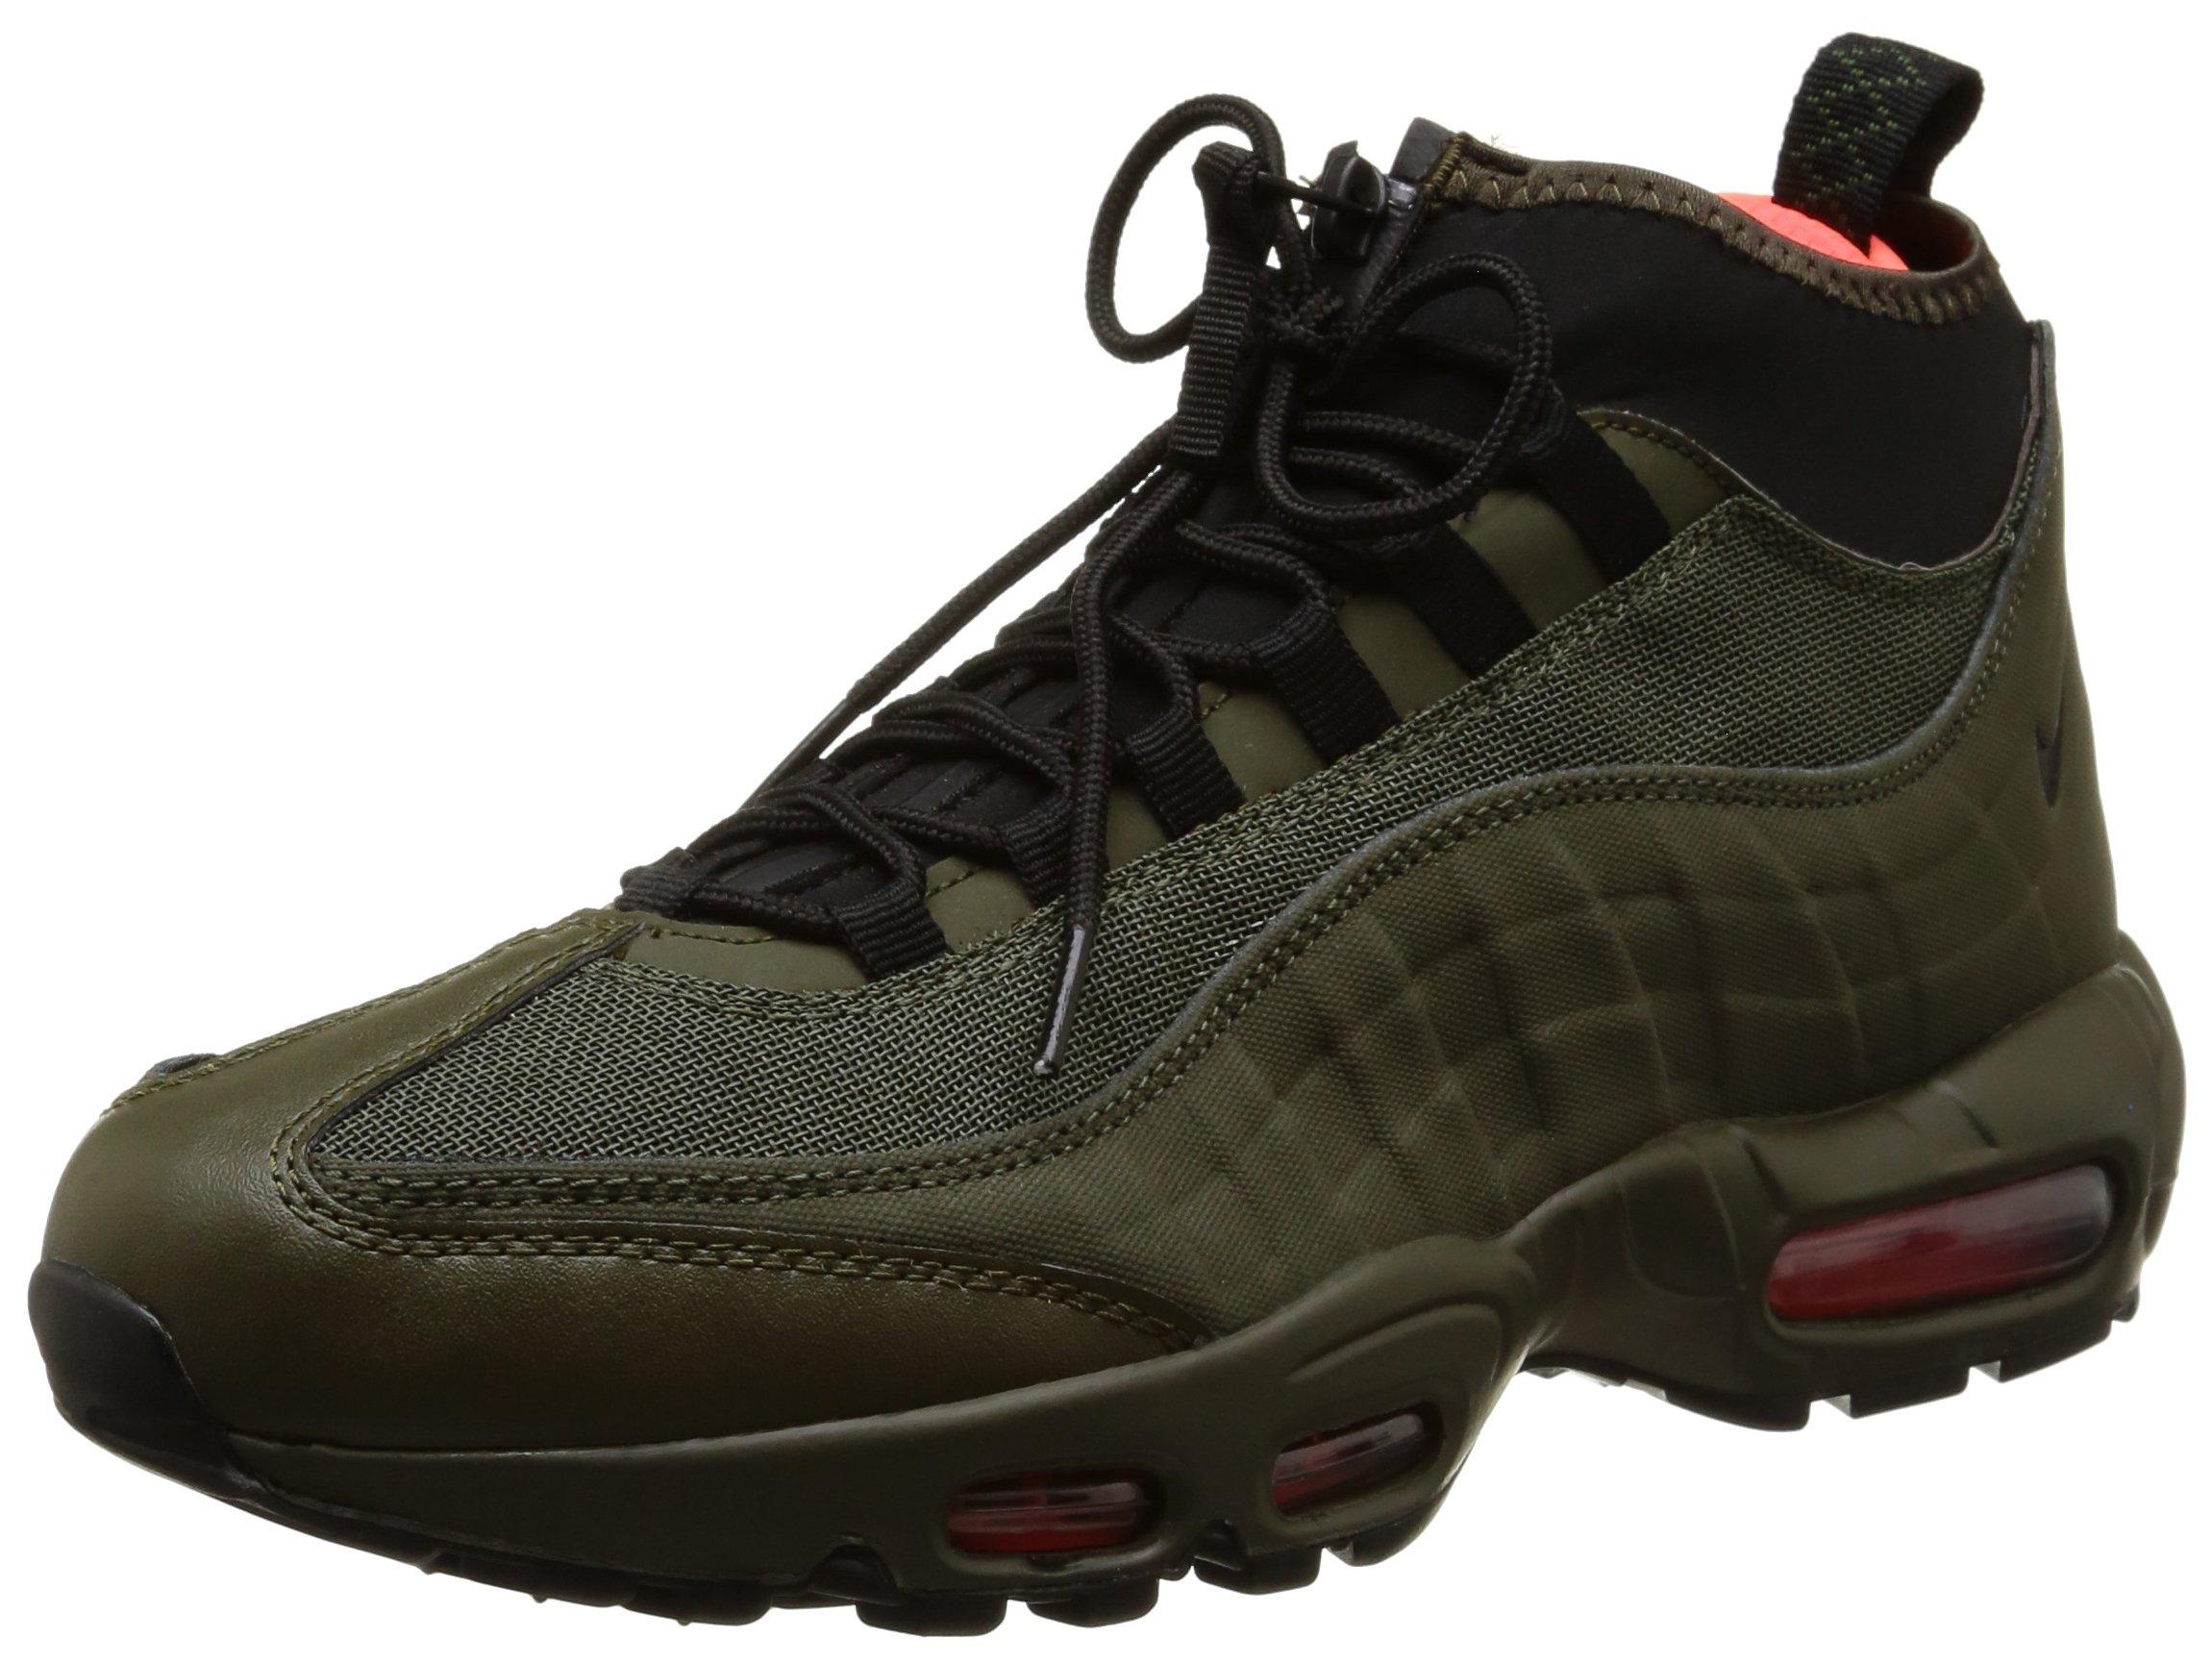 Galleon Nike Air Max 95 Sneakerboot Men's Shoes Dark Loden